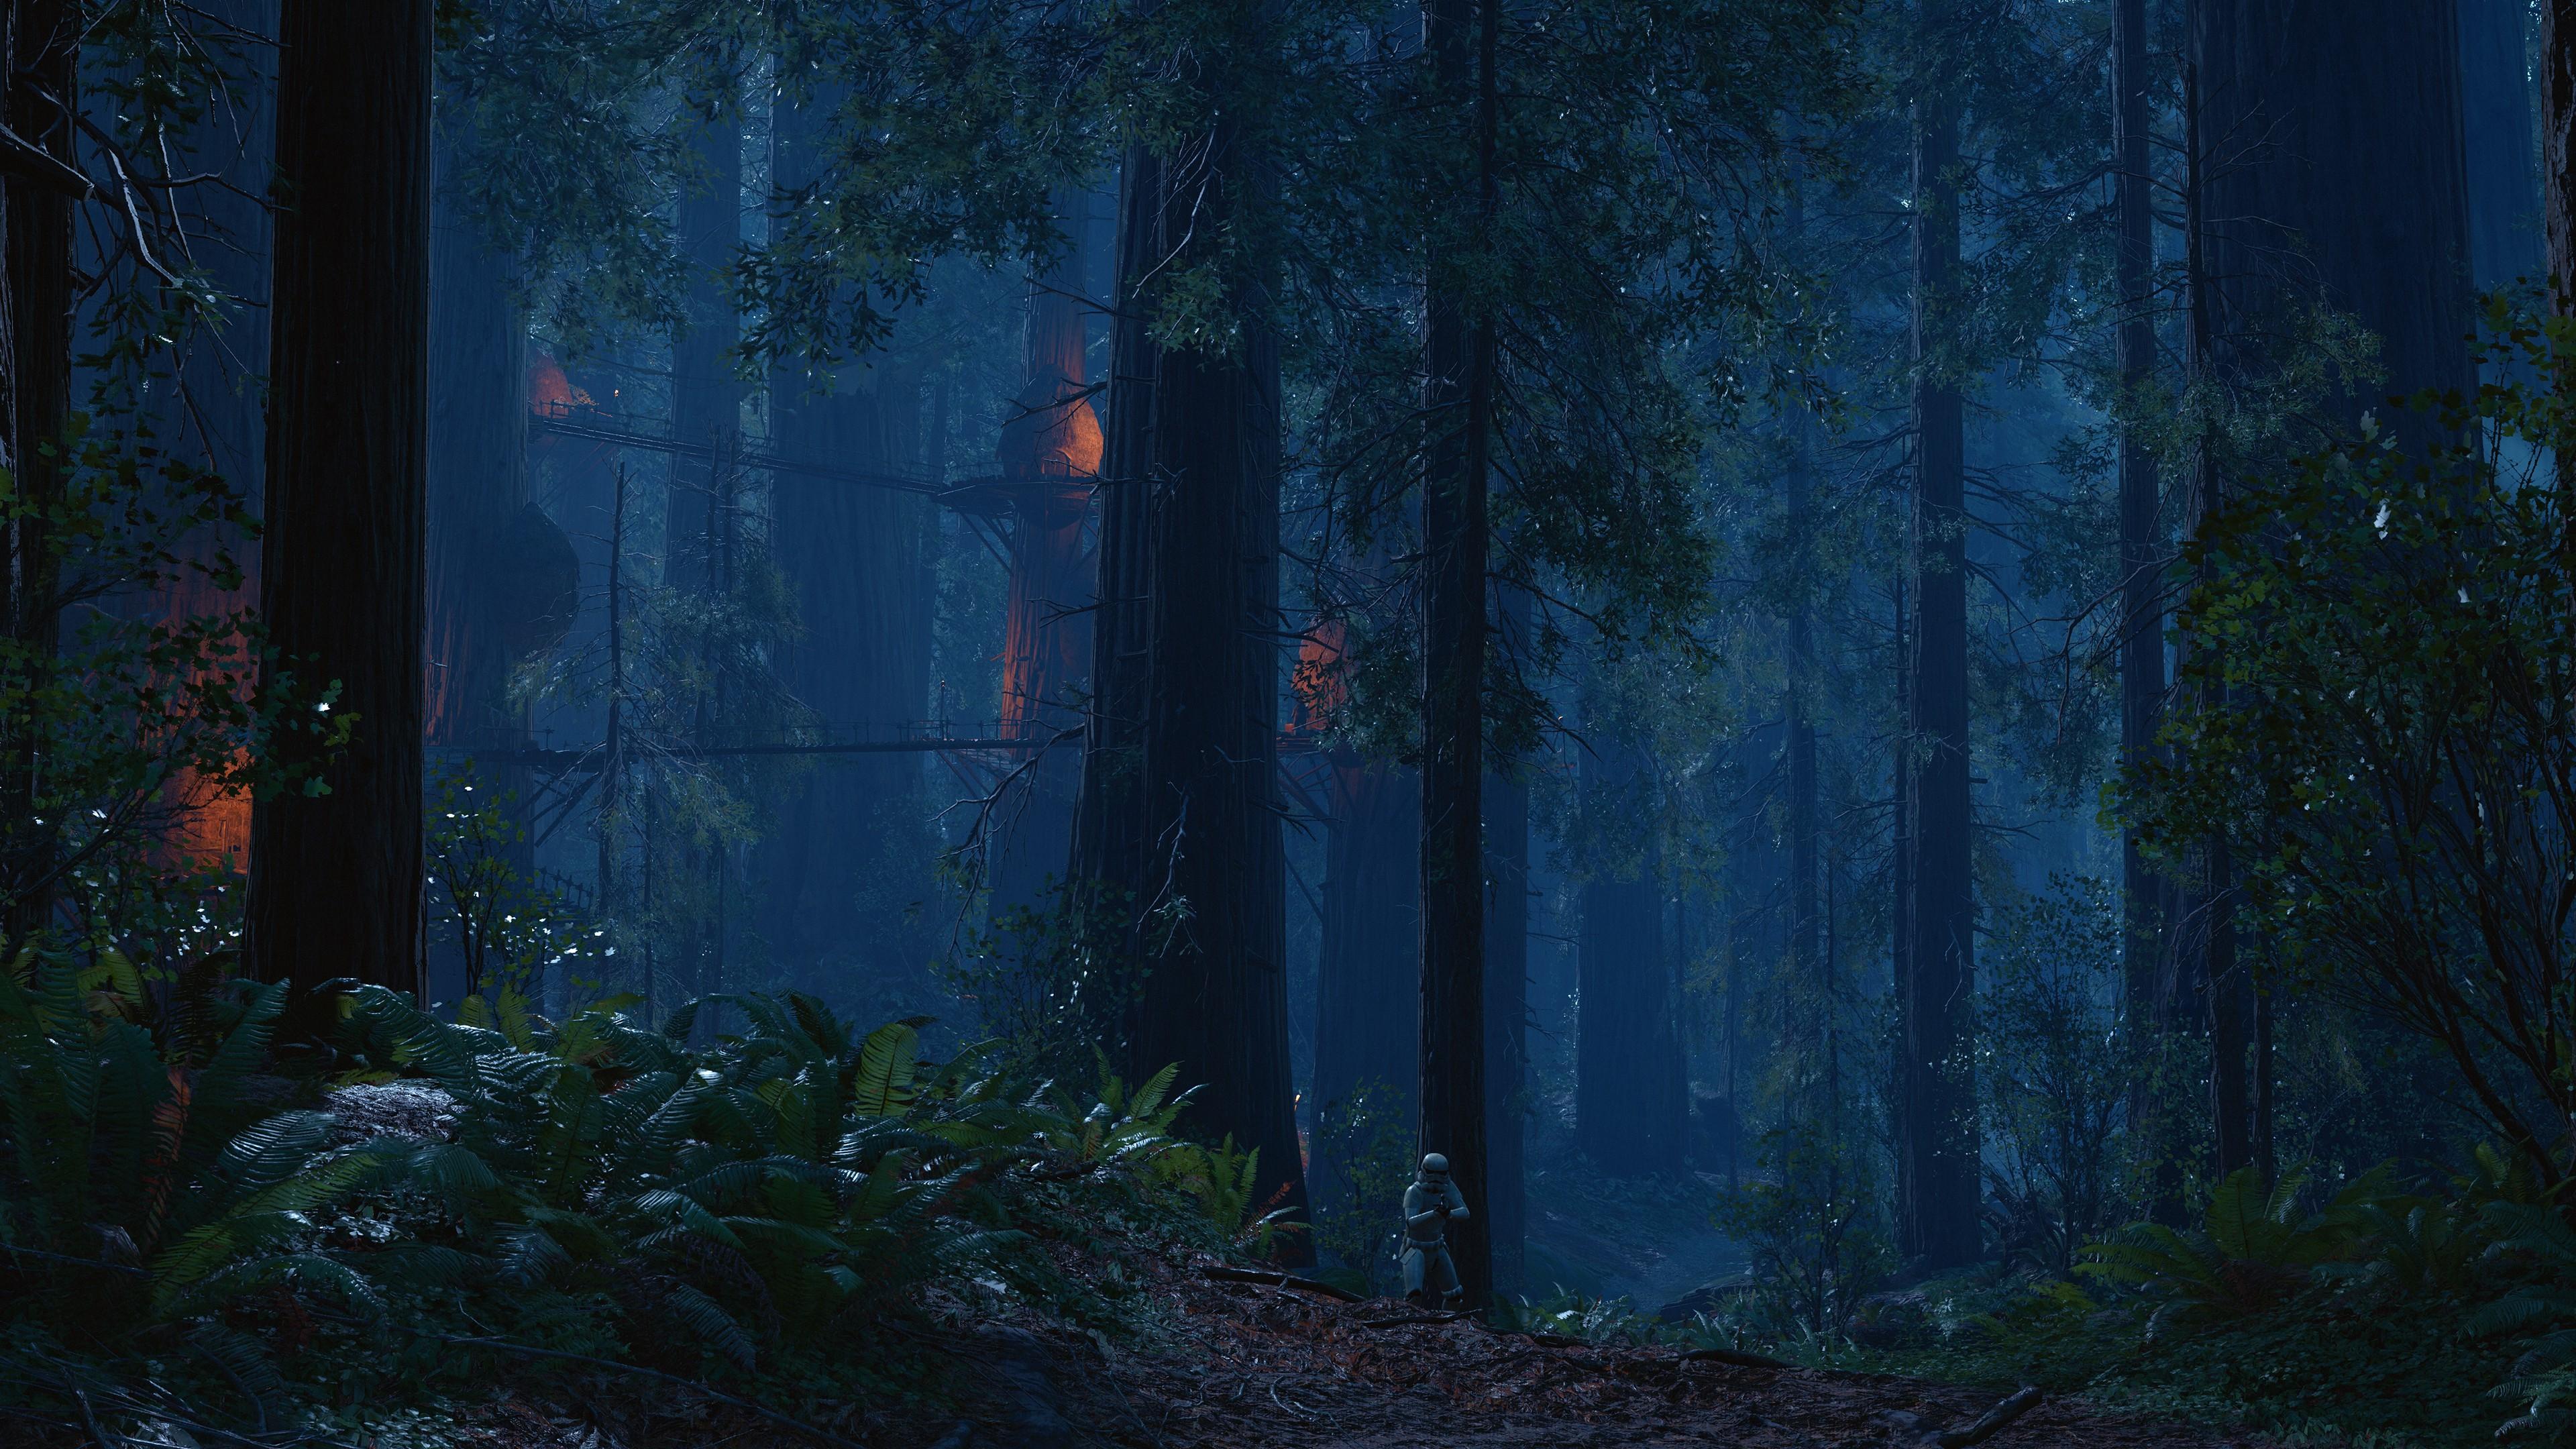 Free Download Tags 3840x2160 Px Battle Of Endor Endor Star Wars